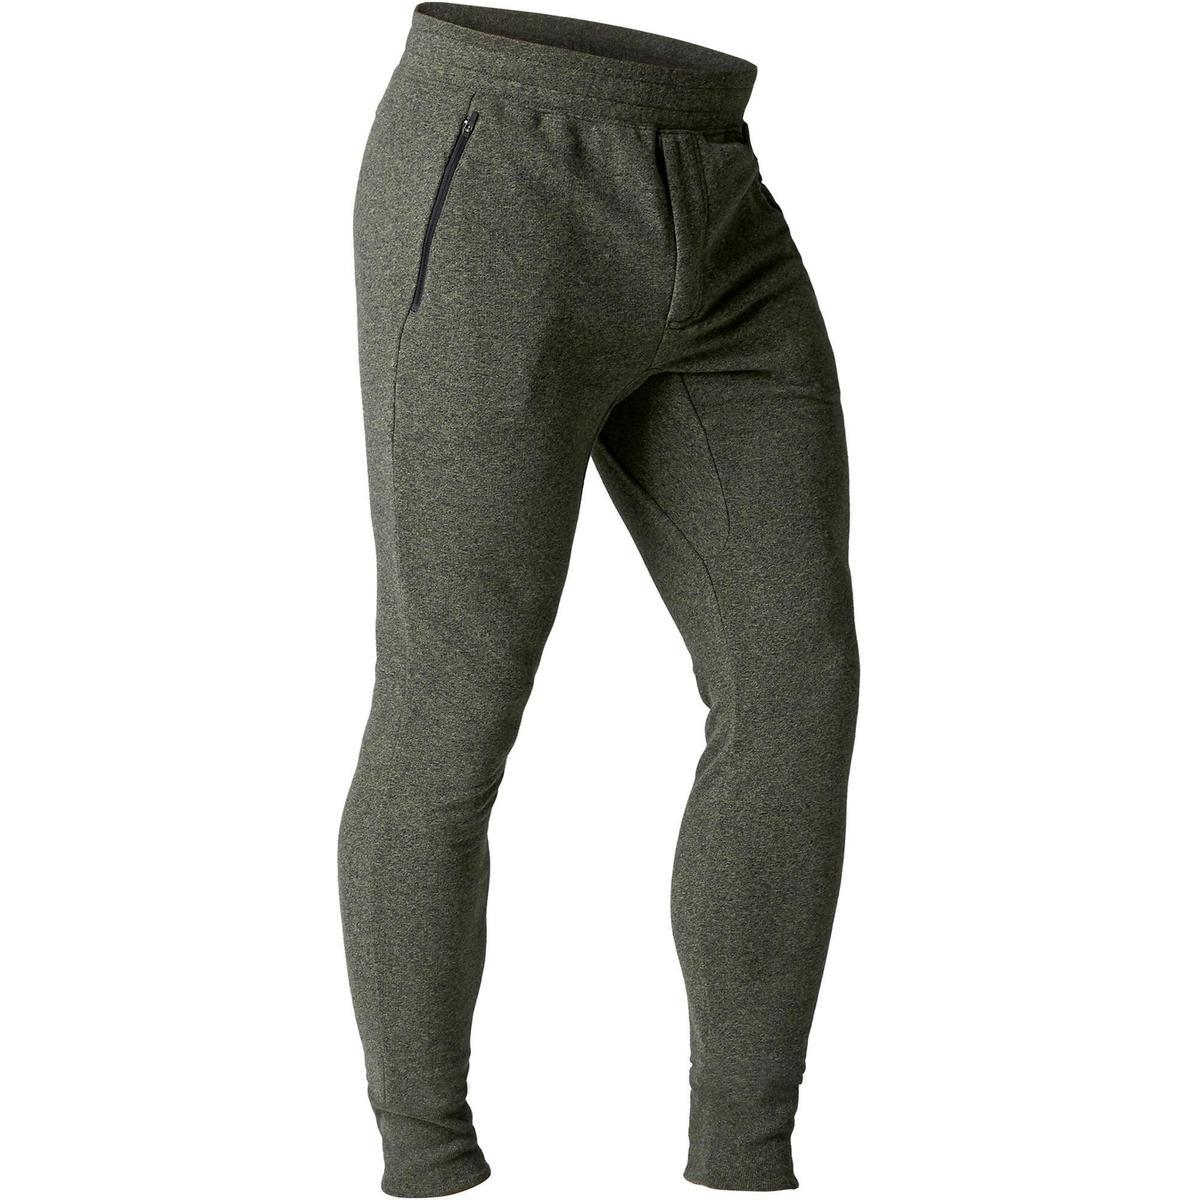 Bild 1 von Jogginghose Gym 500 Skinny Fitness Herren khaki